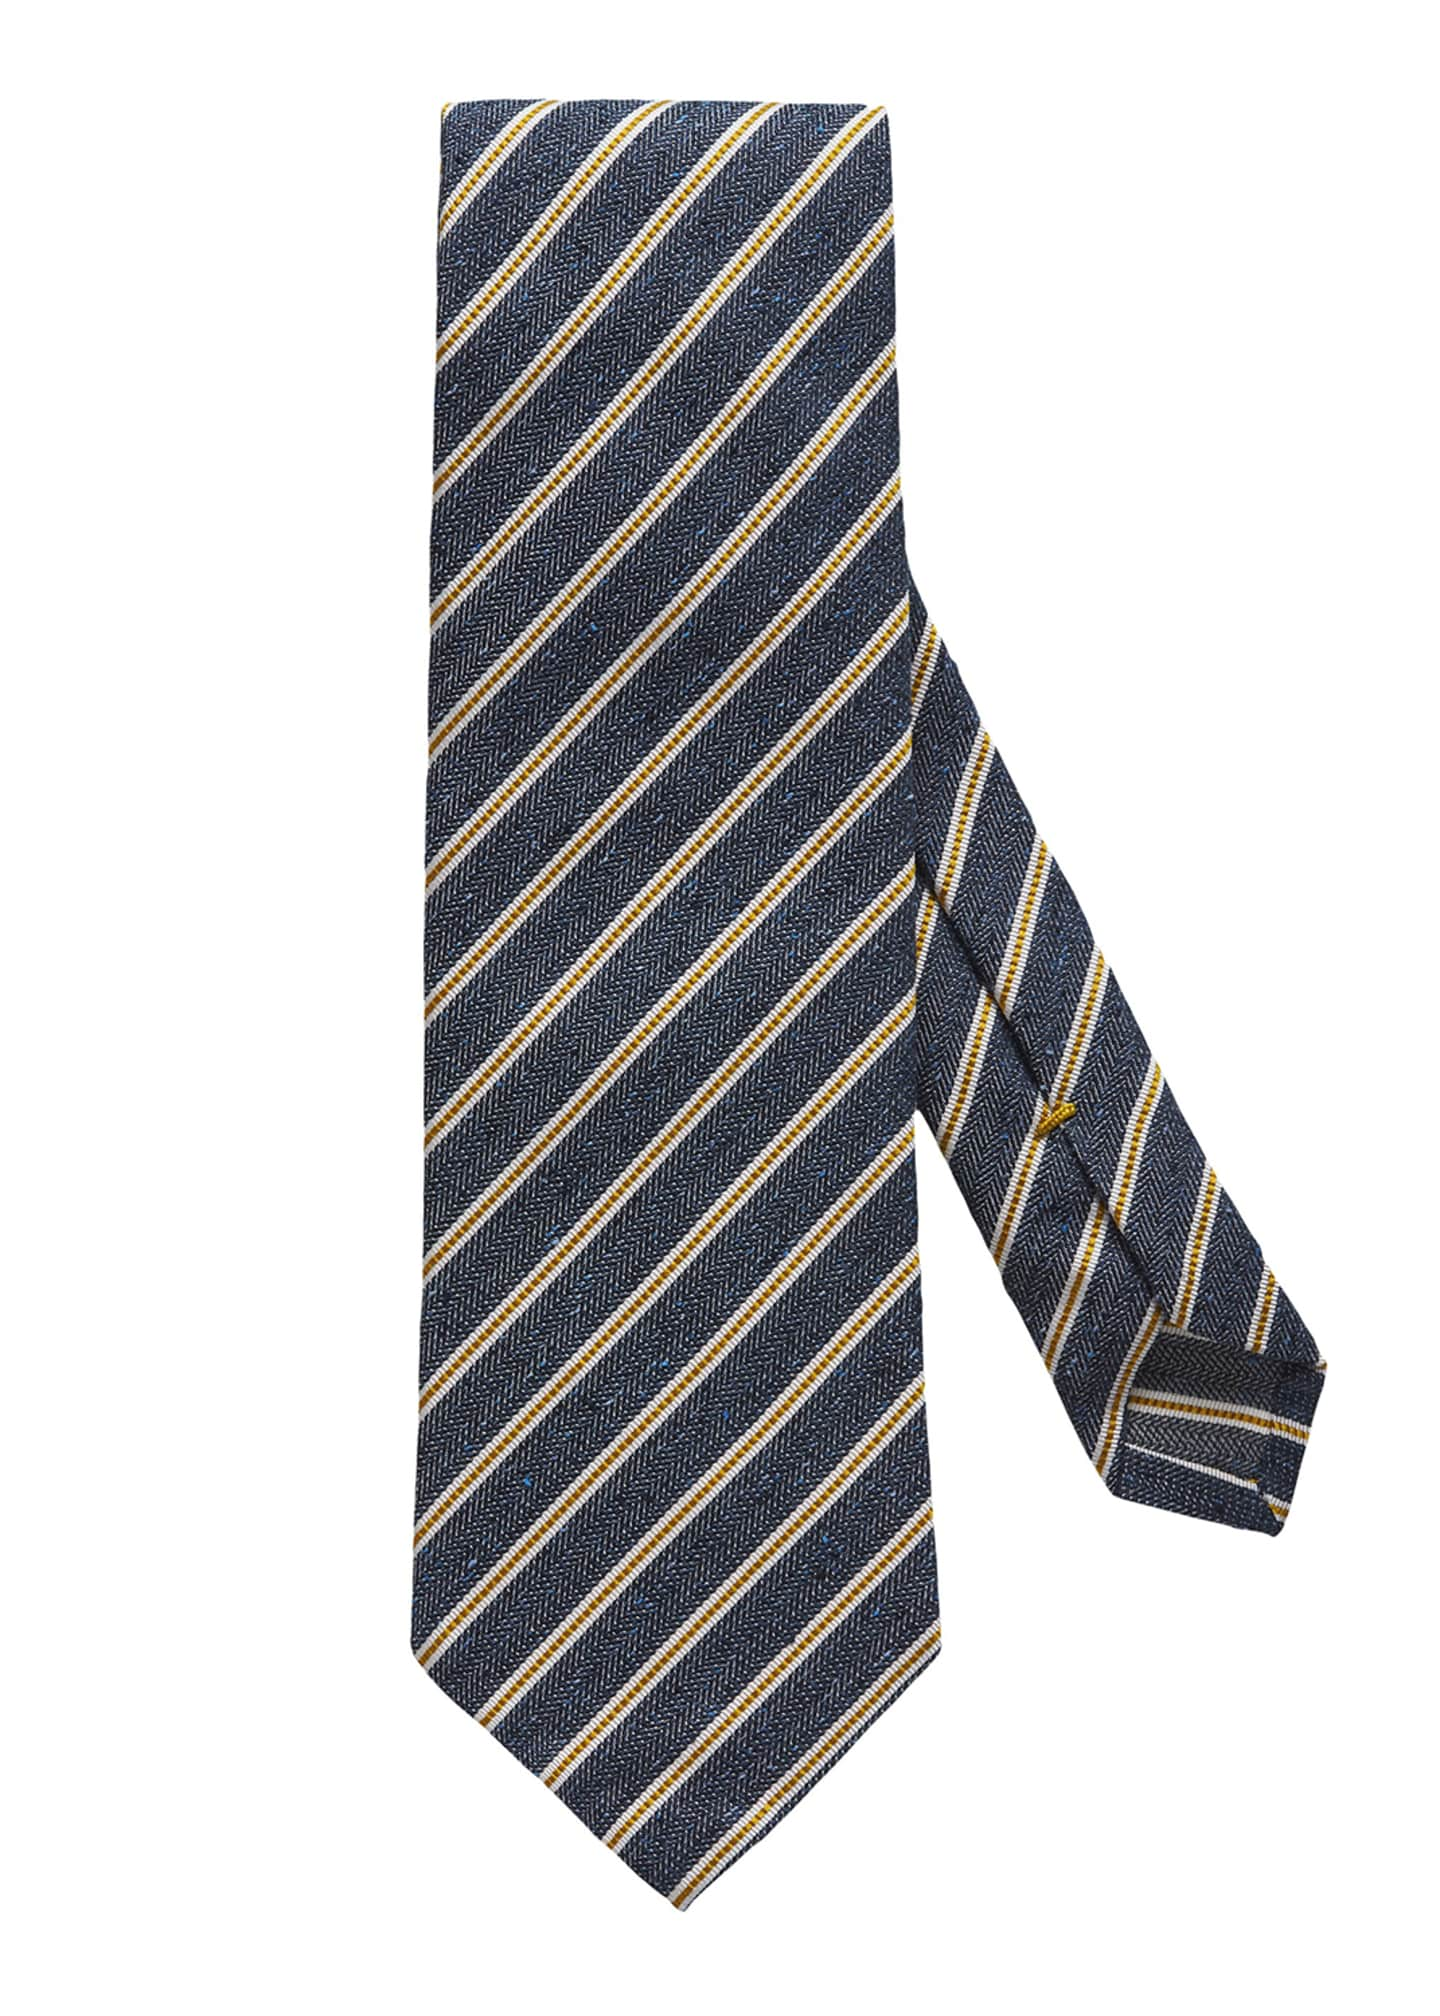 Eton Men's Striped Silk & Cotton Tie